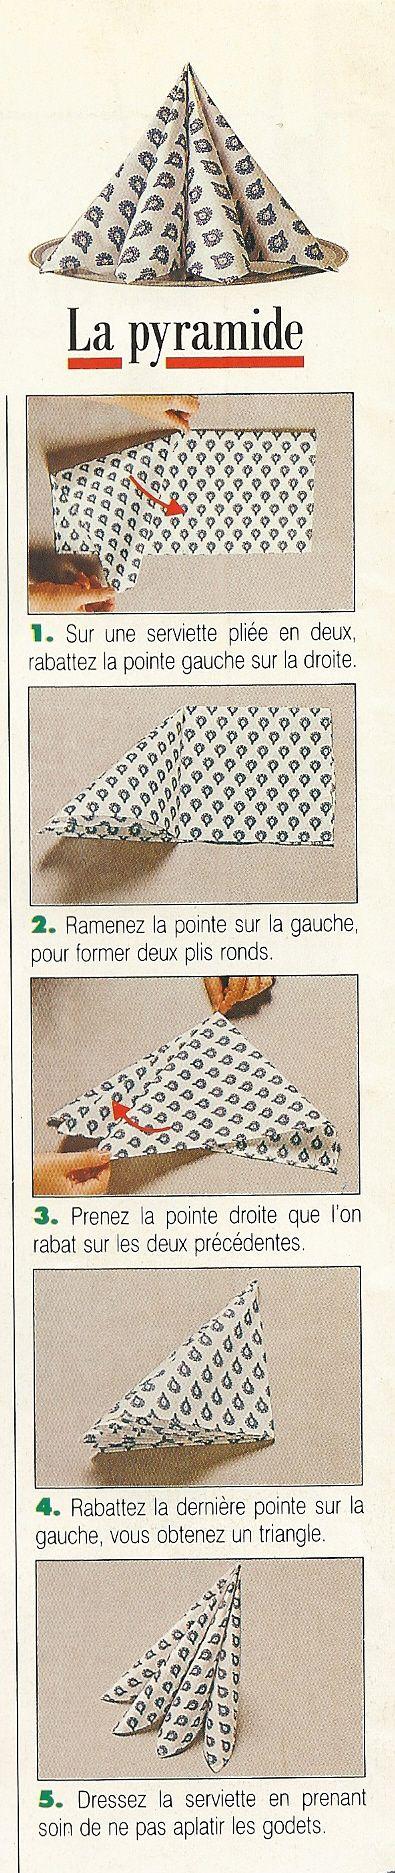 Pliage de serviettes en forme de pyramide.